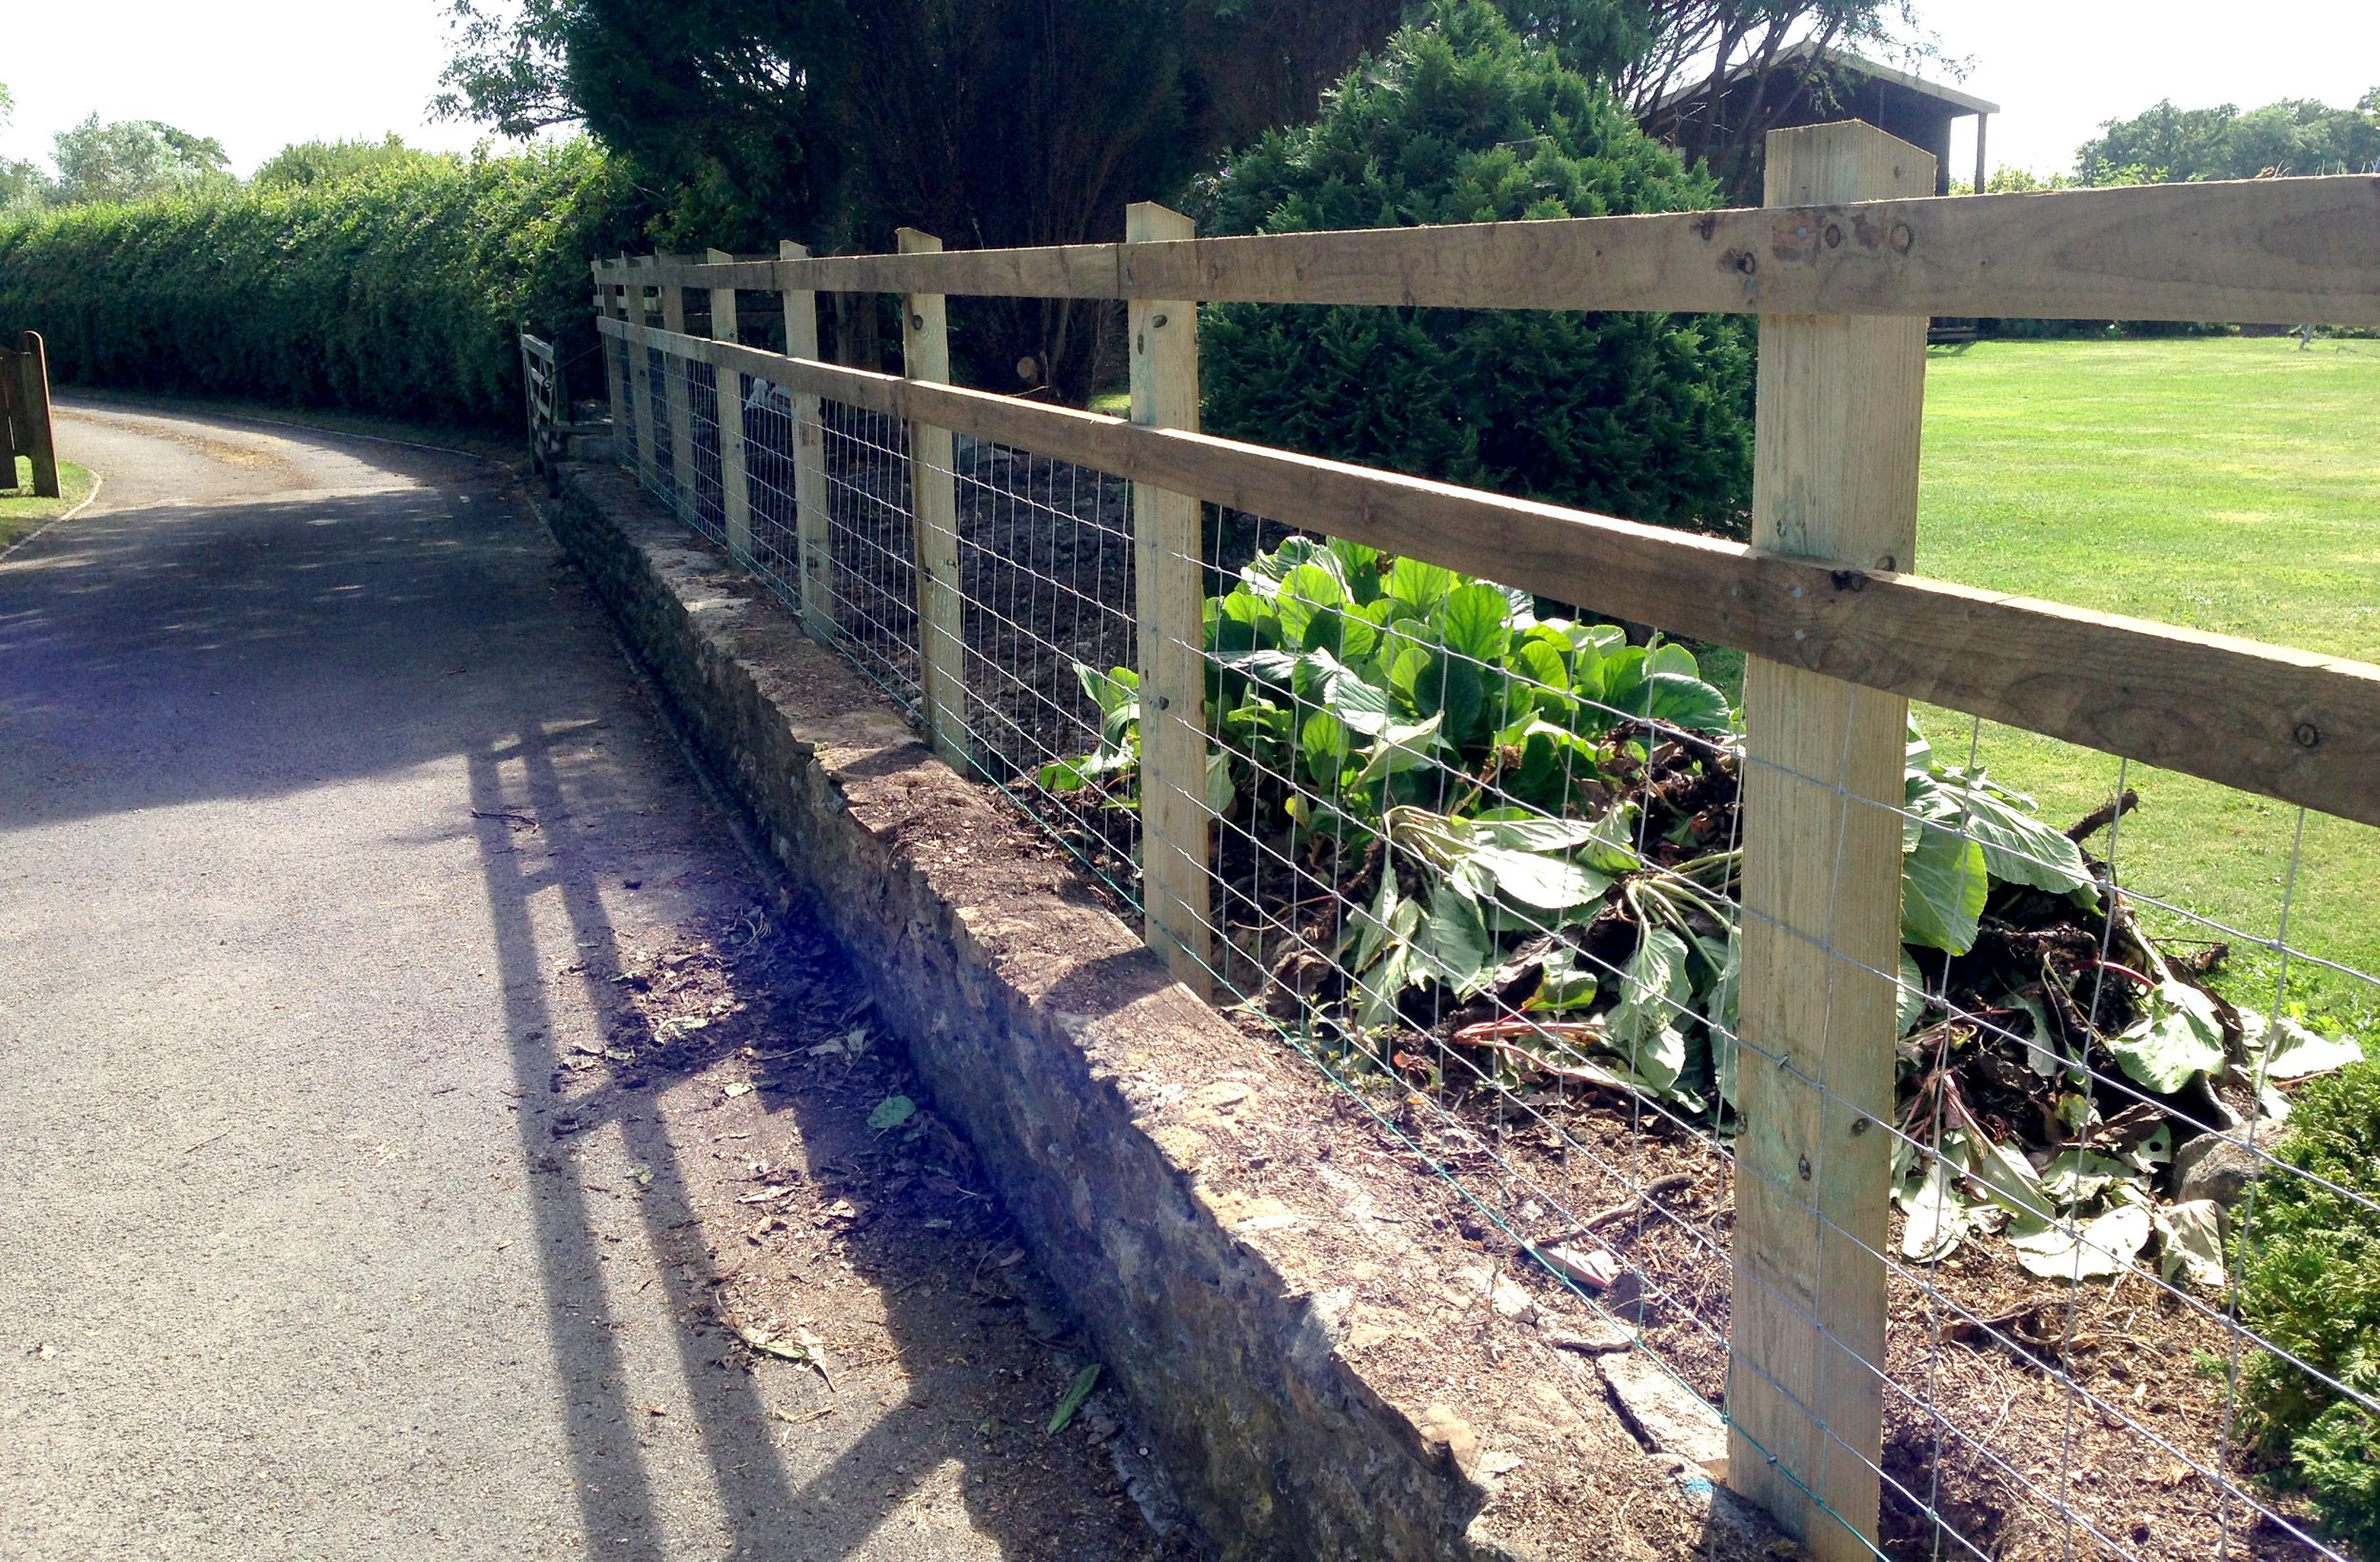 Dorset Garden Fencing • Fencing for Paddocks, Gardens, Stock Fencing ...